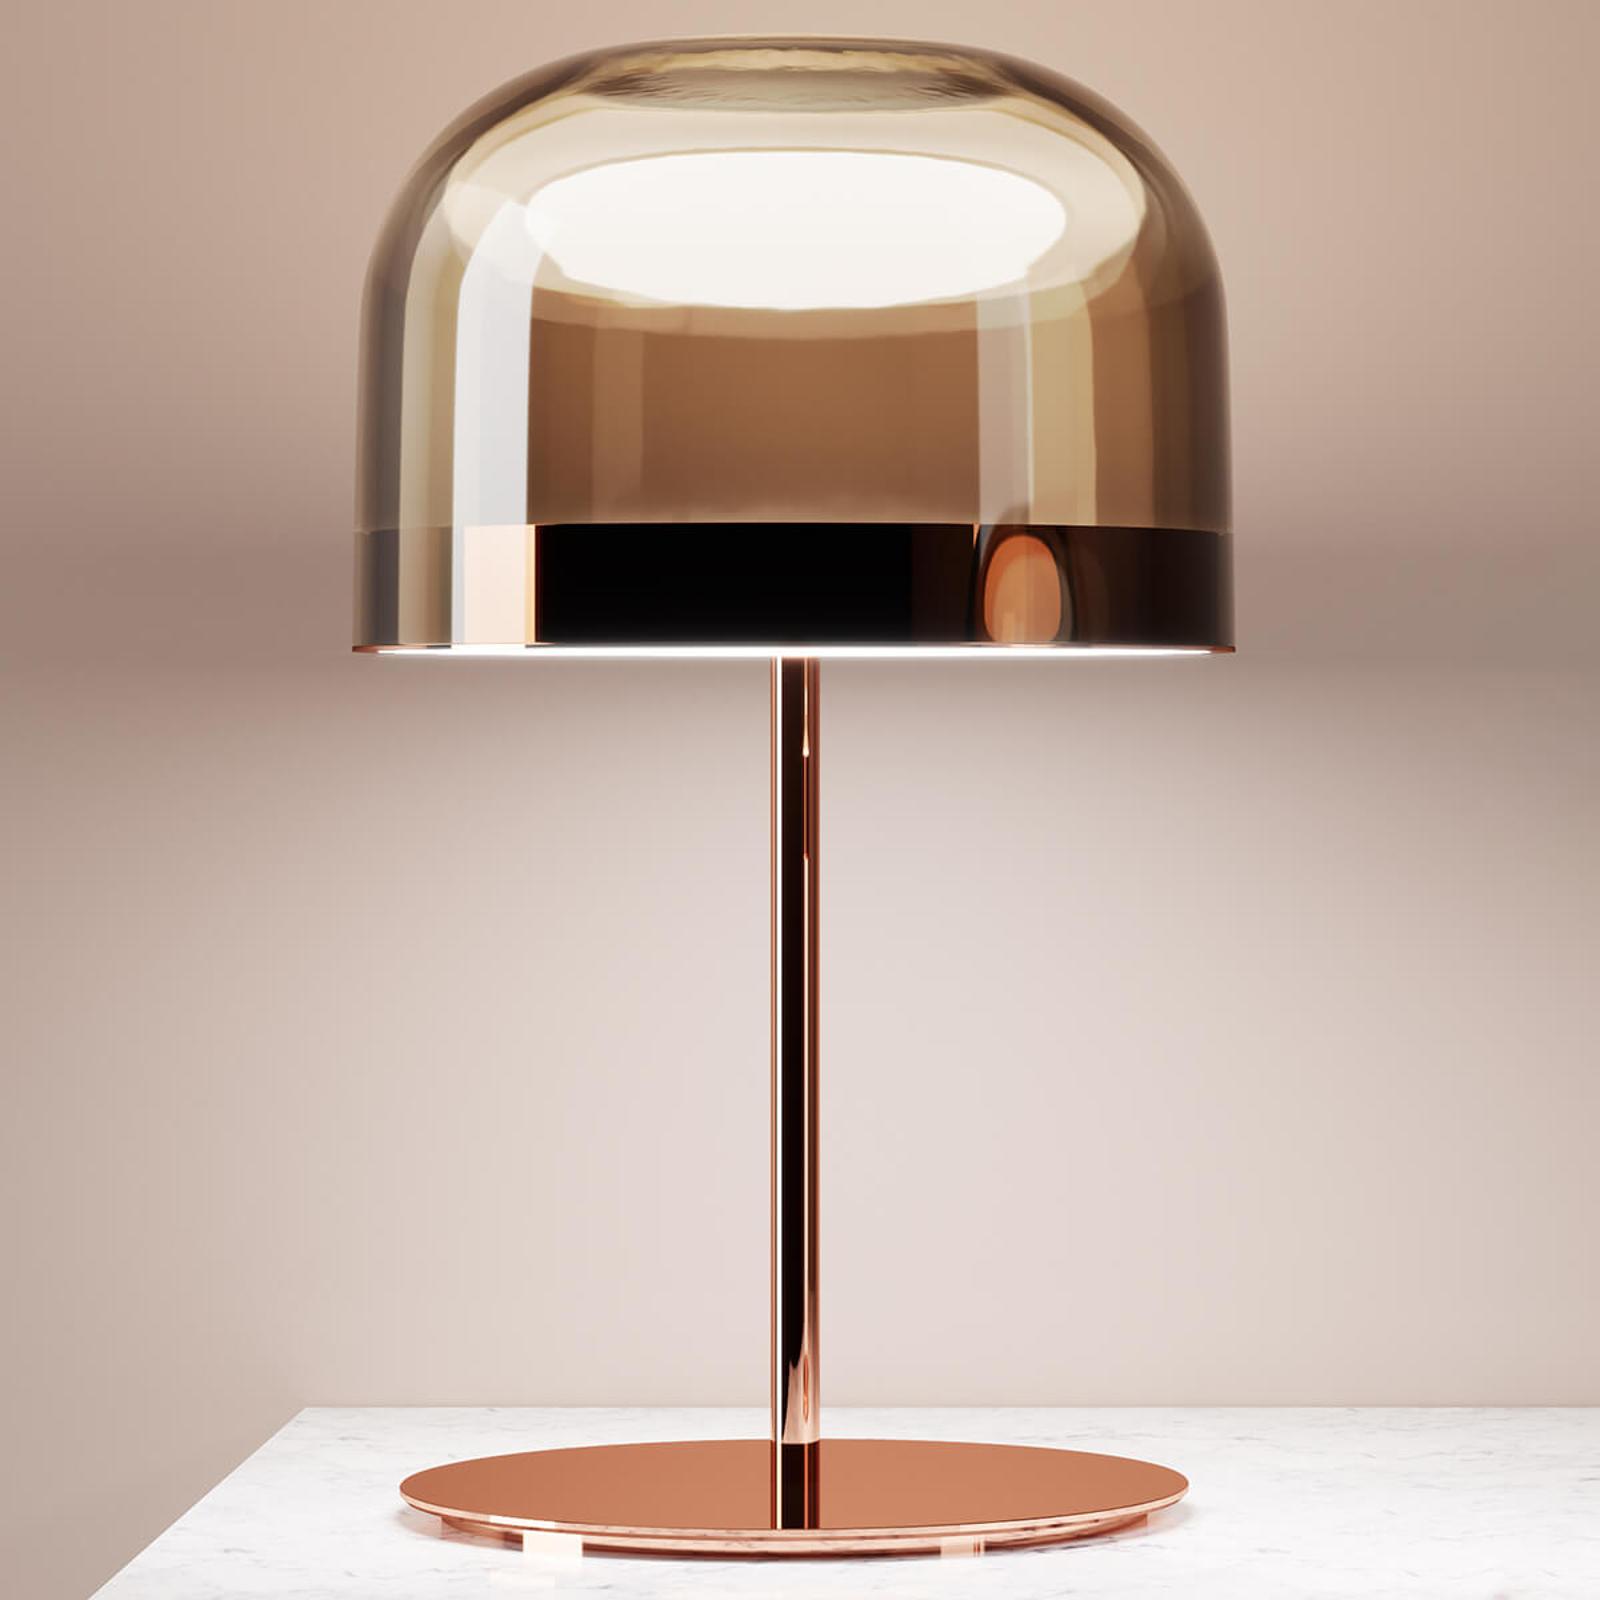 Lampa stołowa LED Equatore w miedzi, 60 cm